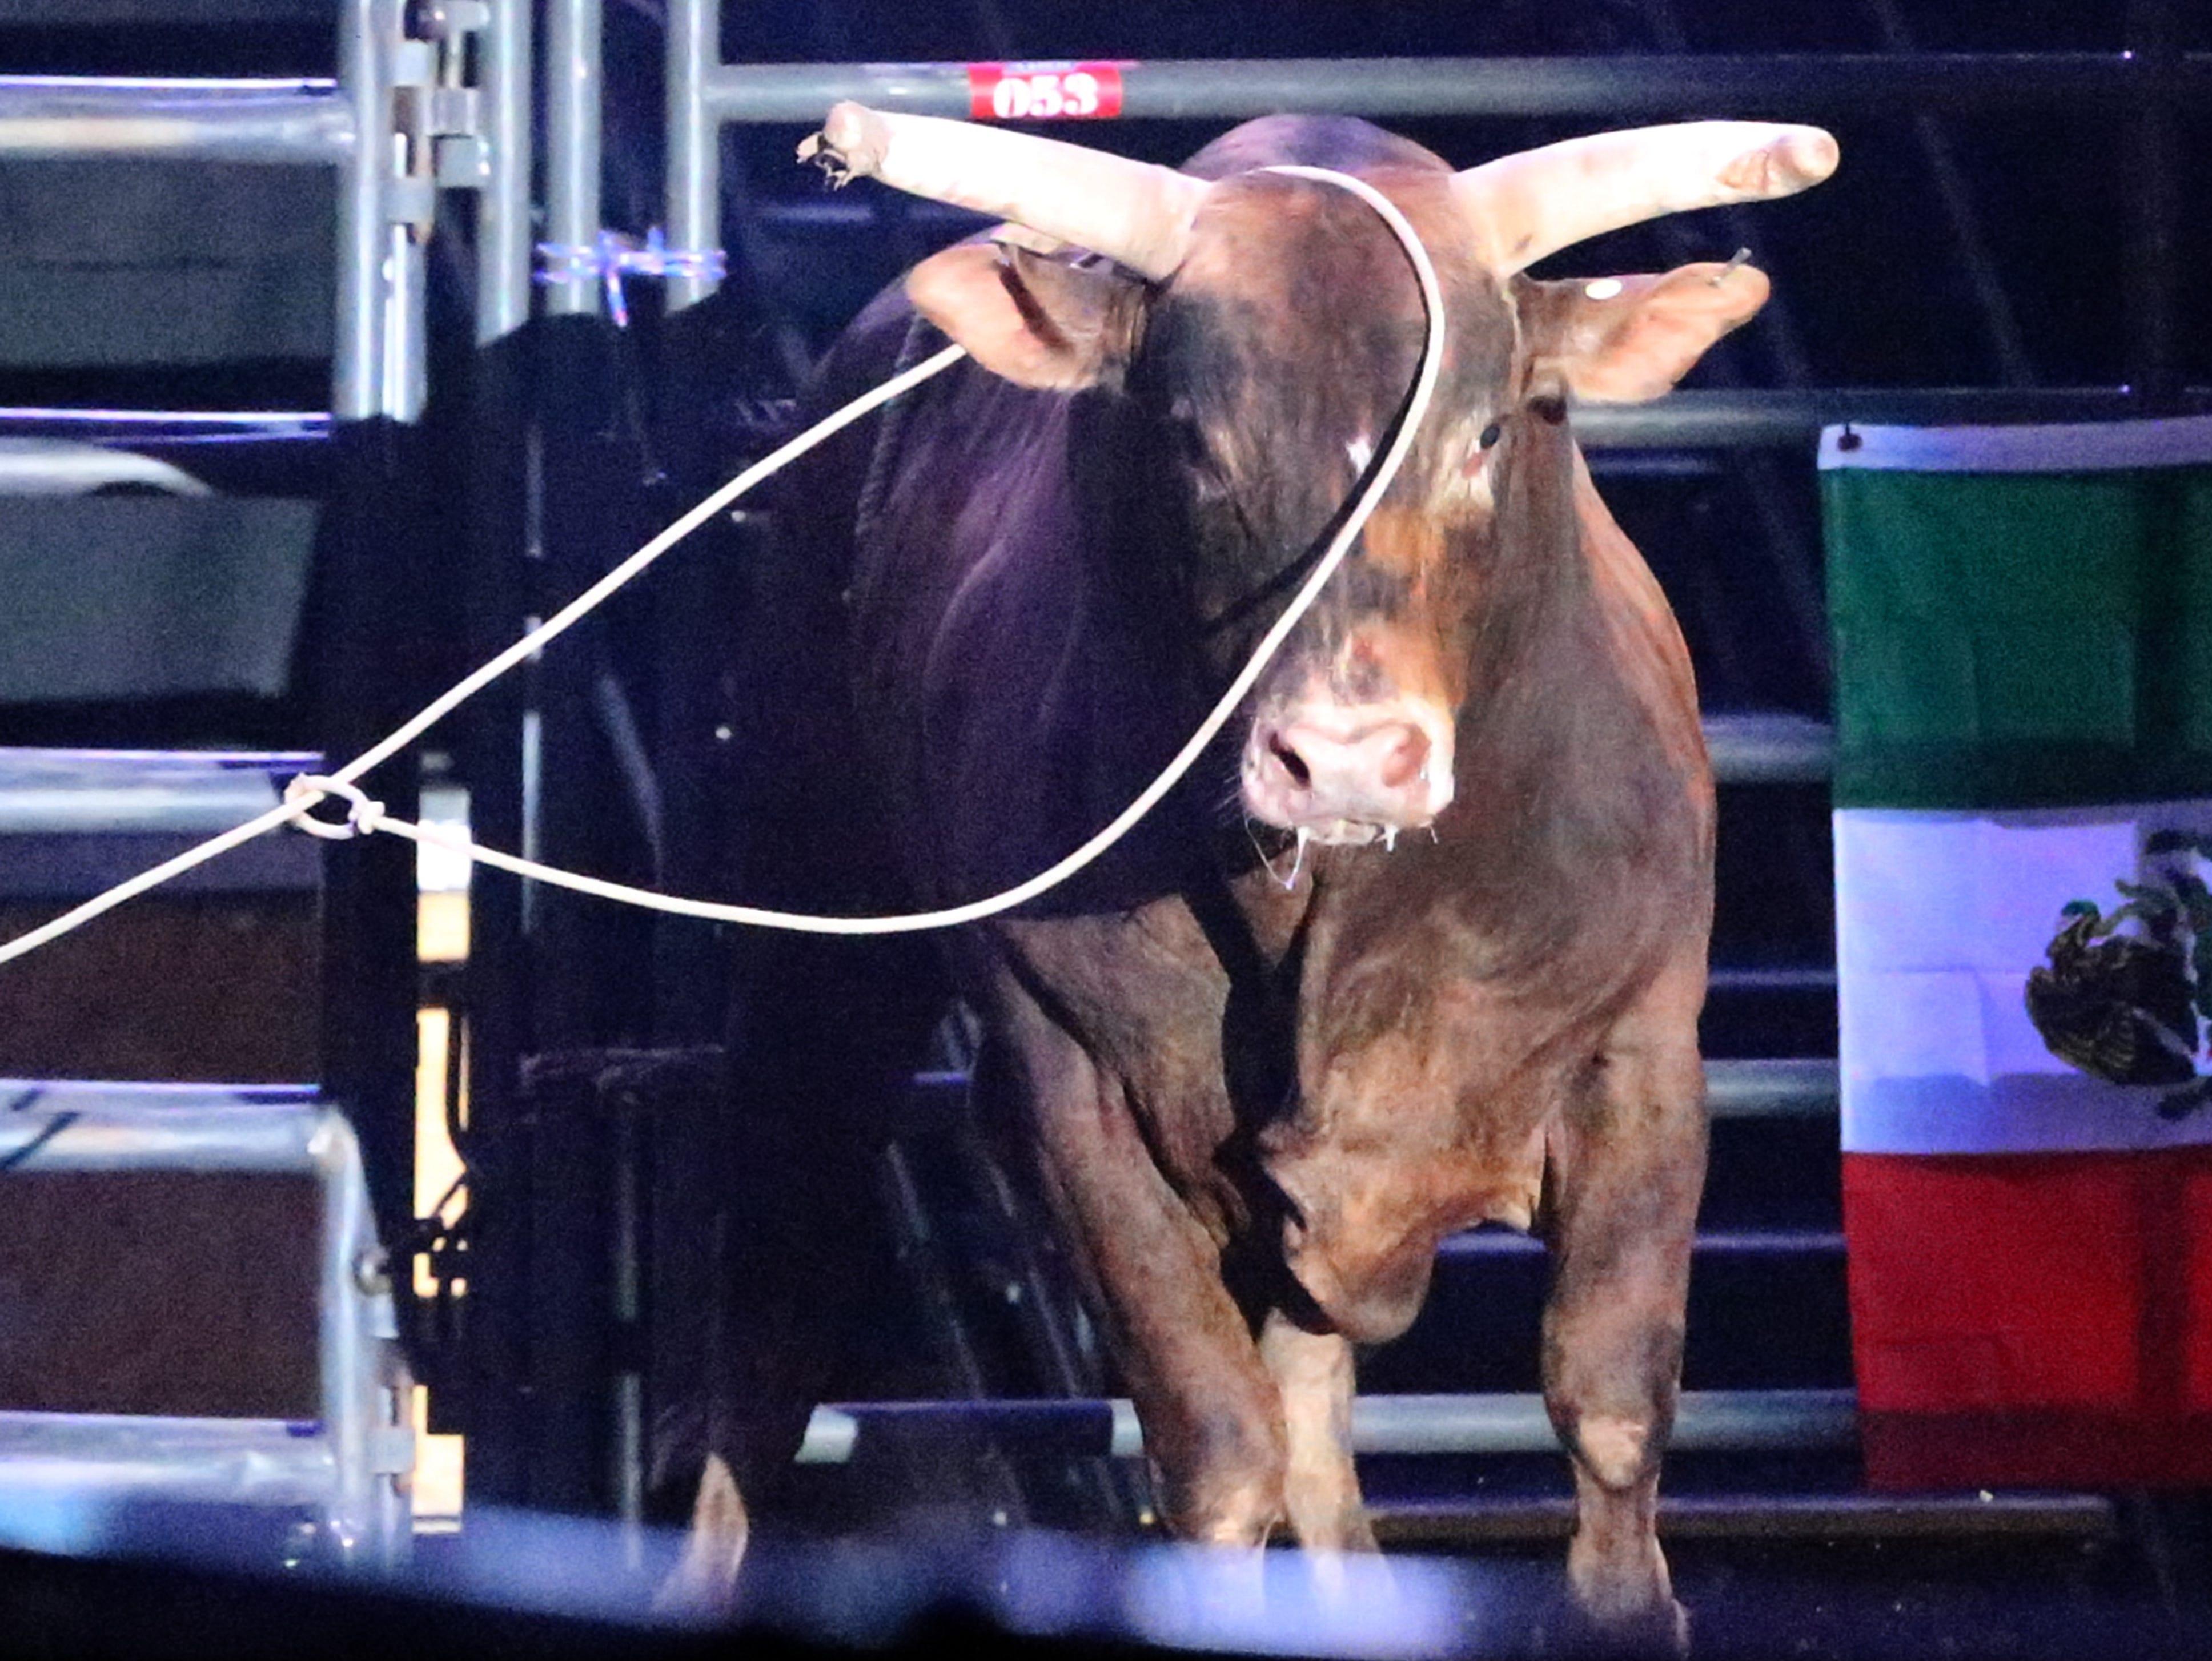 Horsemen nab a bull Saturday night during bull riding demonstrations.